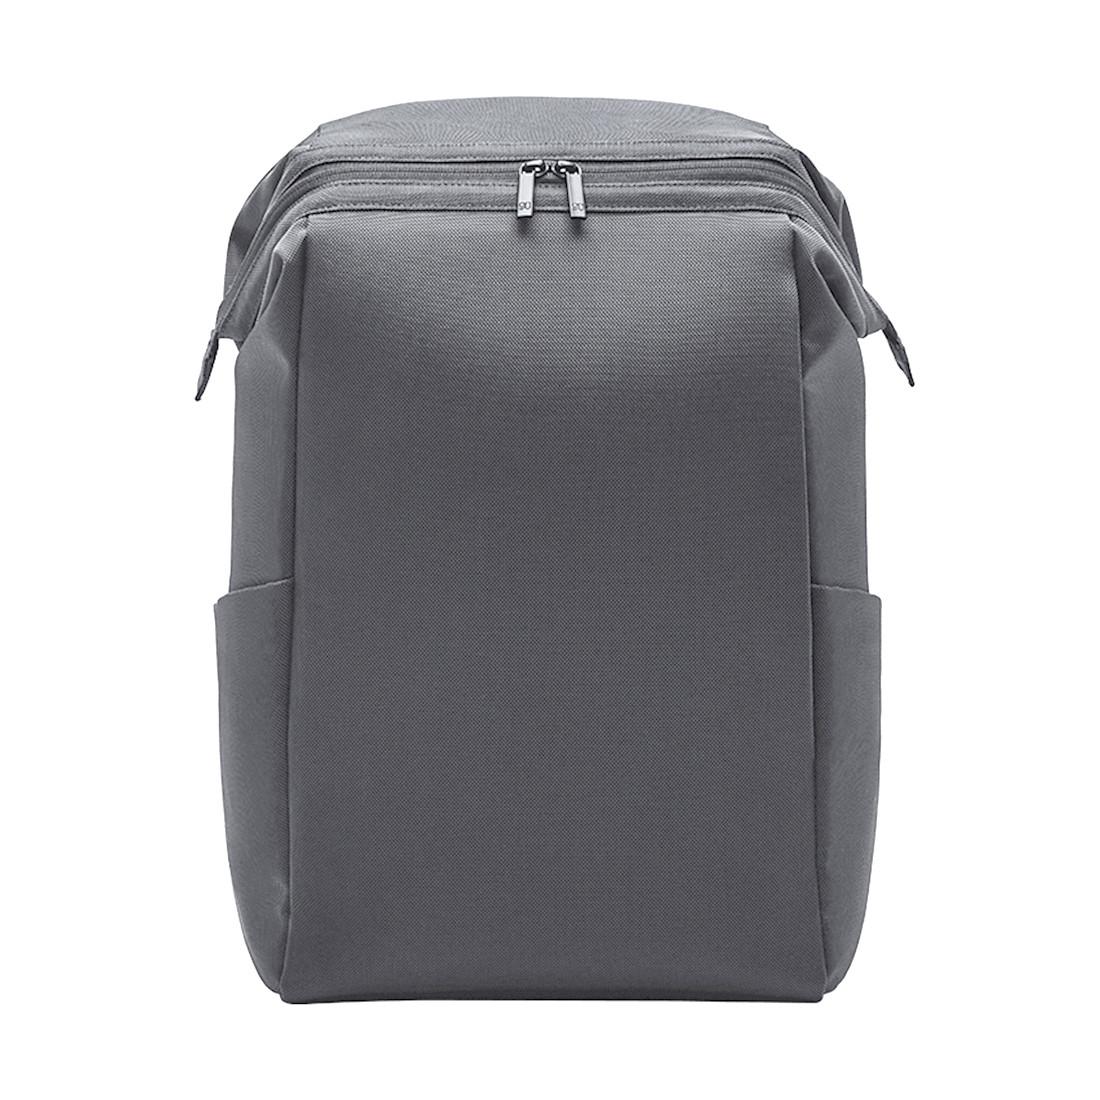 Рюкзак Xiaomi 90 Points Multitasker Commuter Backpack (6971732587593) Серый